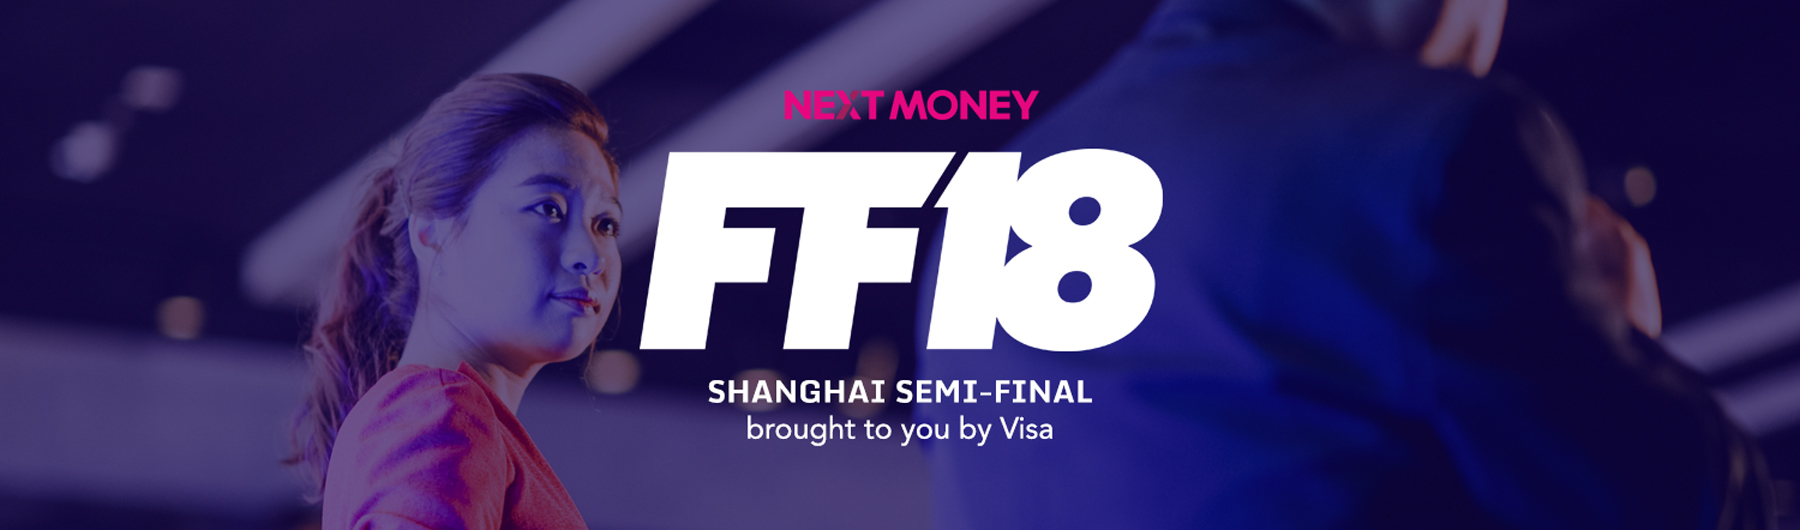 FF18 Shanghai Semi-Final Fintech Pitch Competition